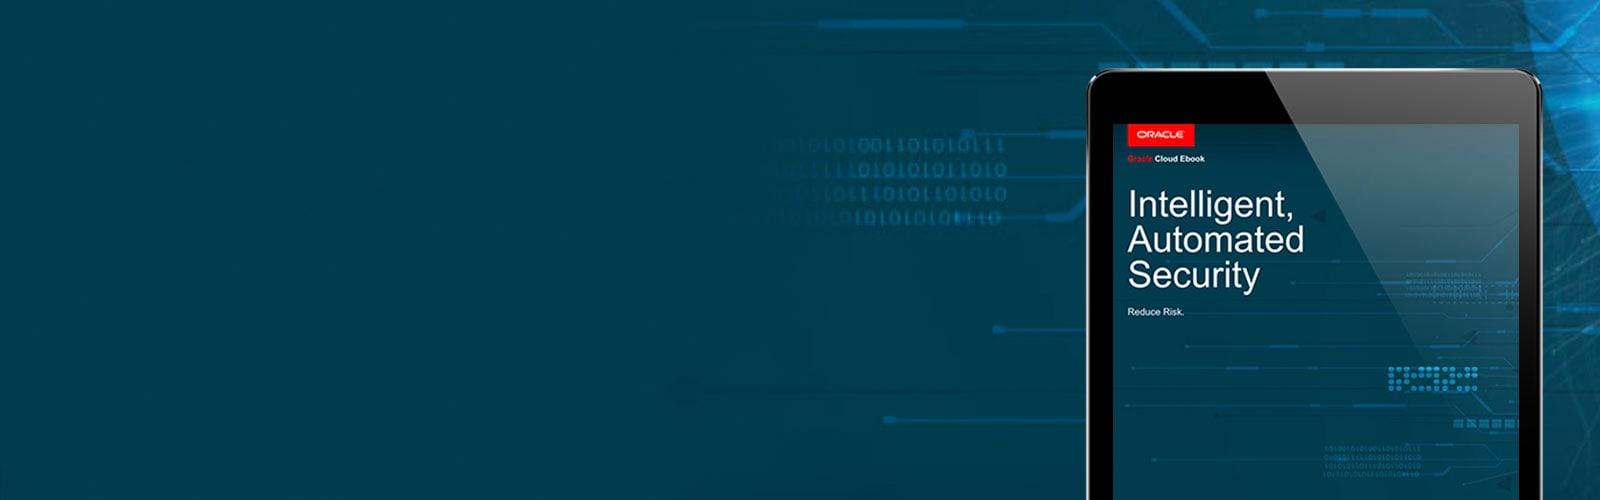 Emerging Security Technologies Protect Sensitive Data